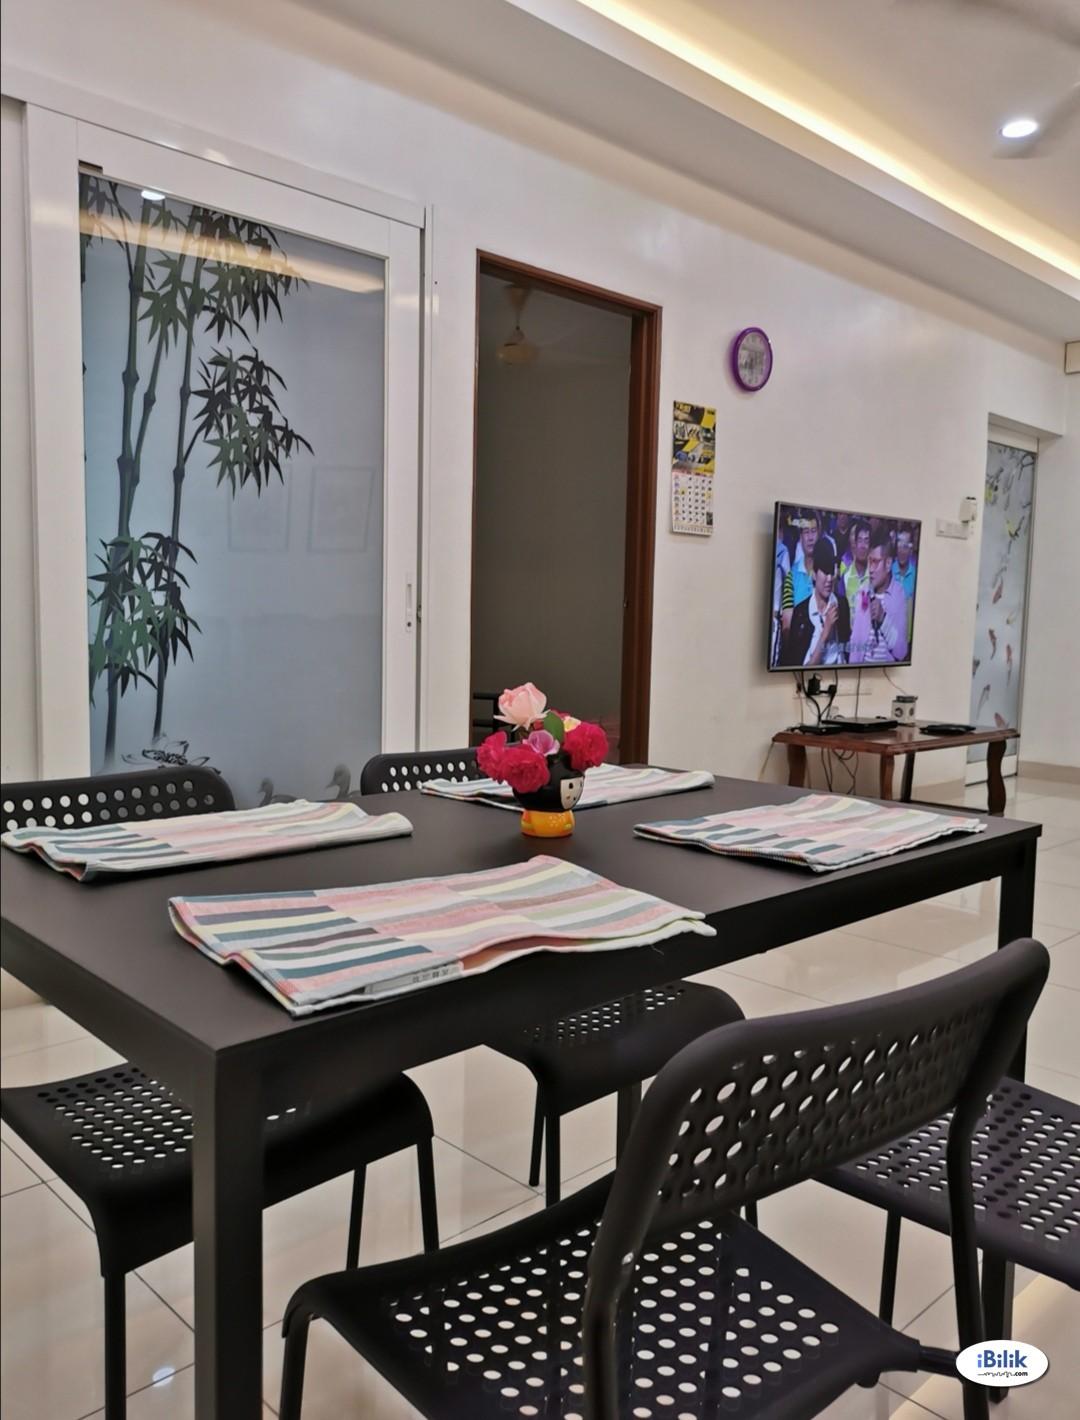 Happy family homestay at Taman Sri Rambai, Bukit Mertajam